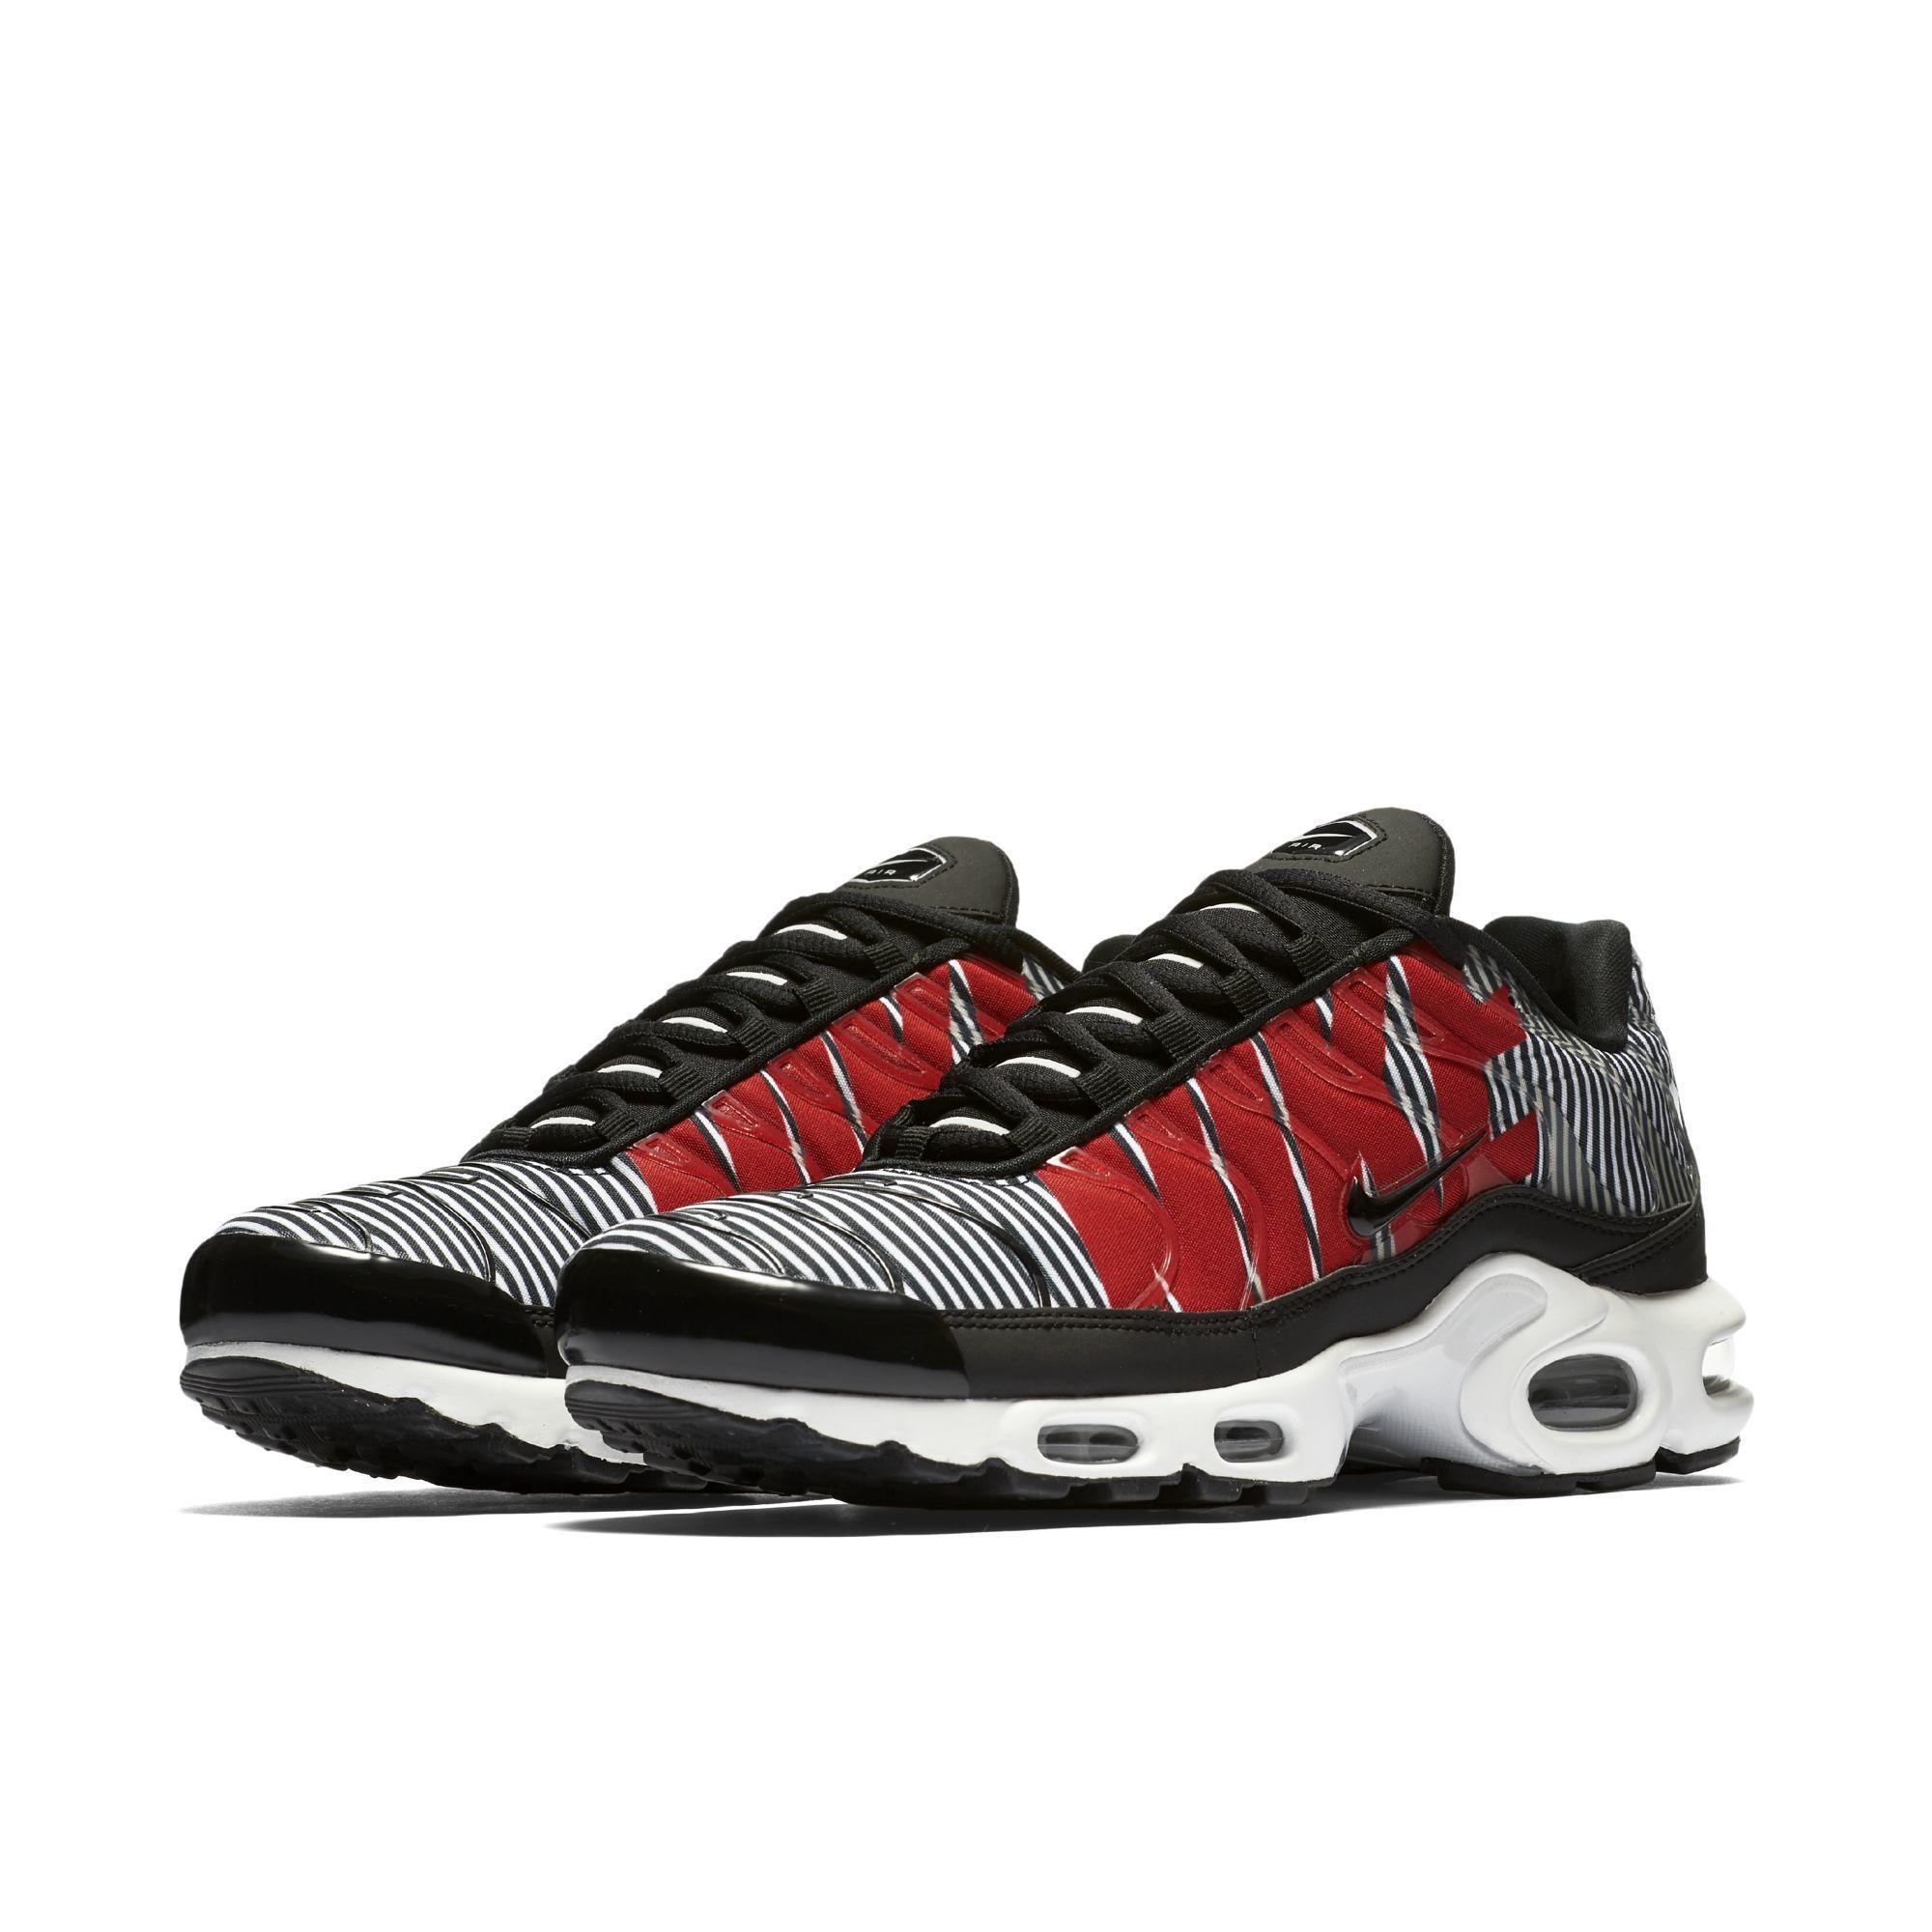 Nike Air Max Plus Stripes 1